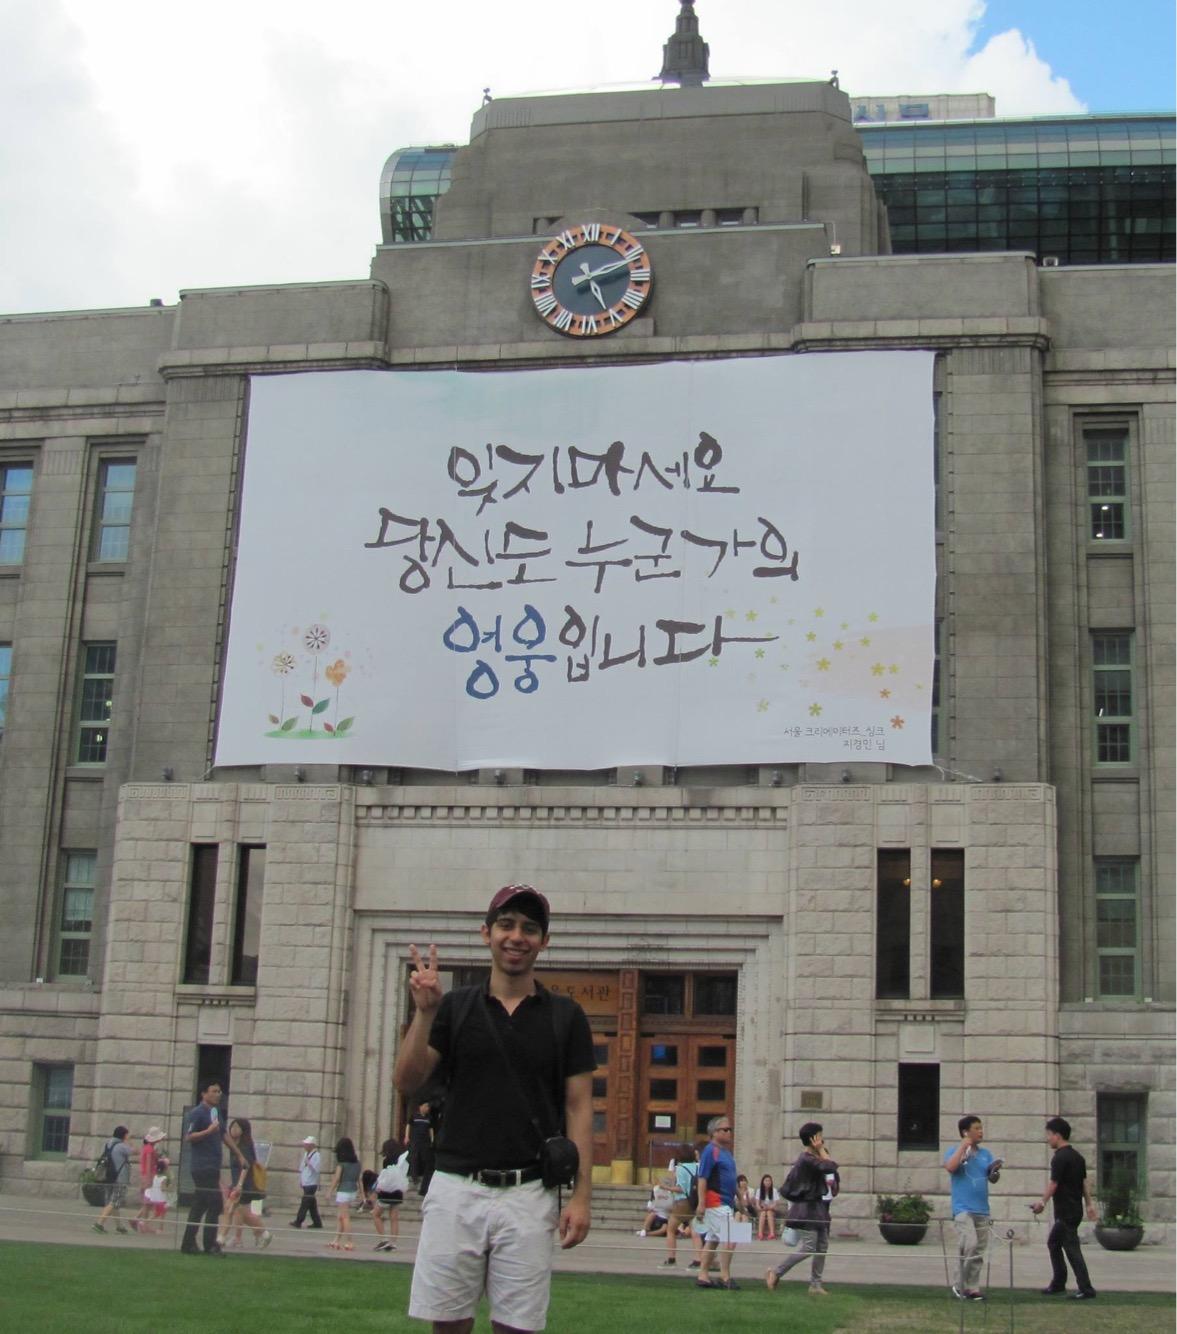 South Korea - June 2013Downtown Seoul,City Hall